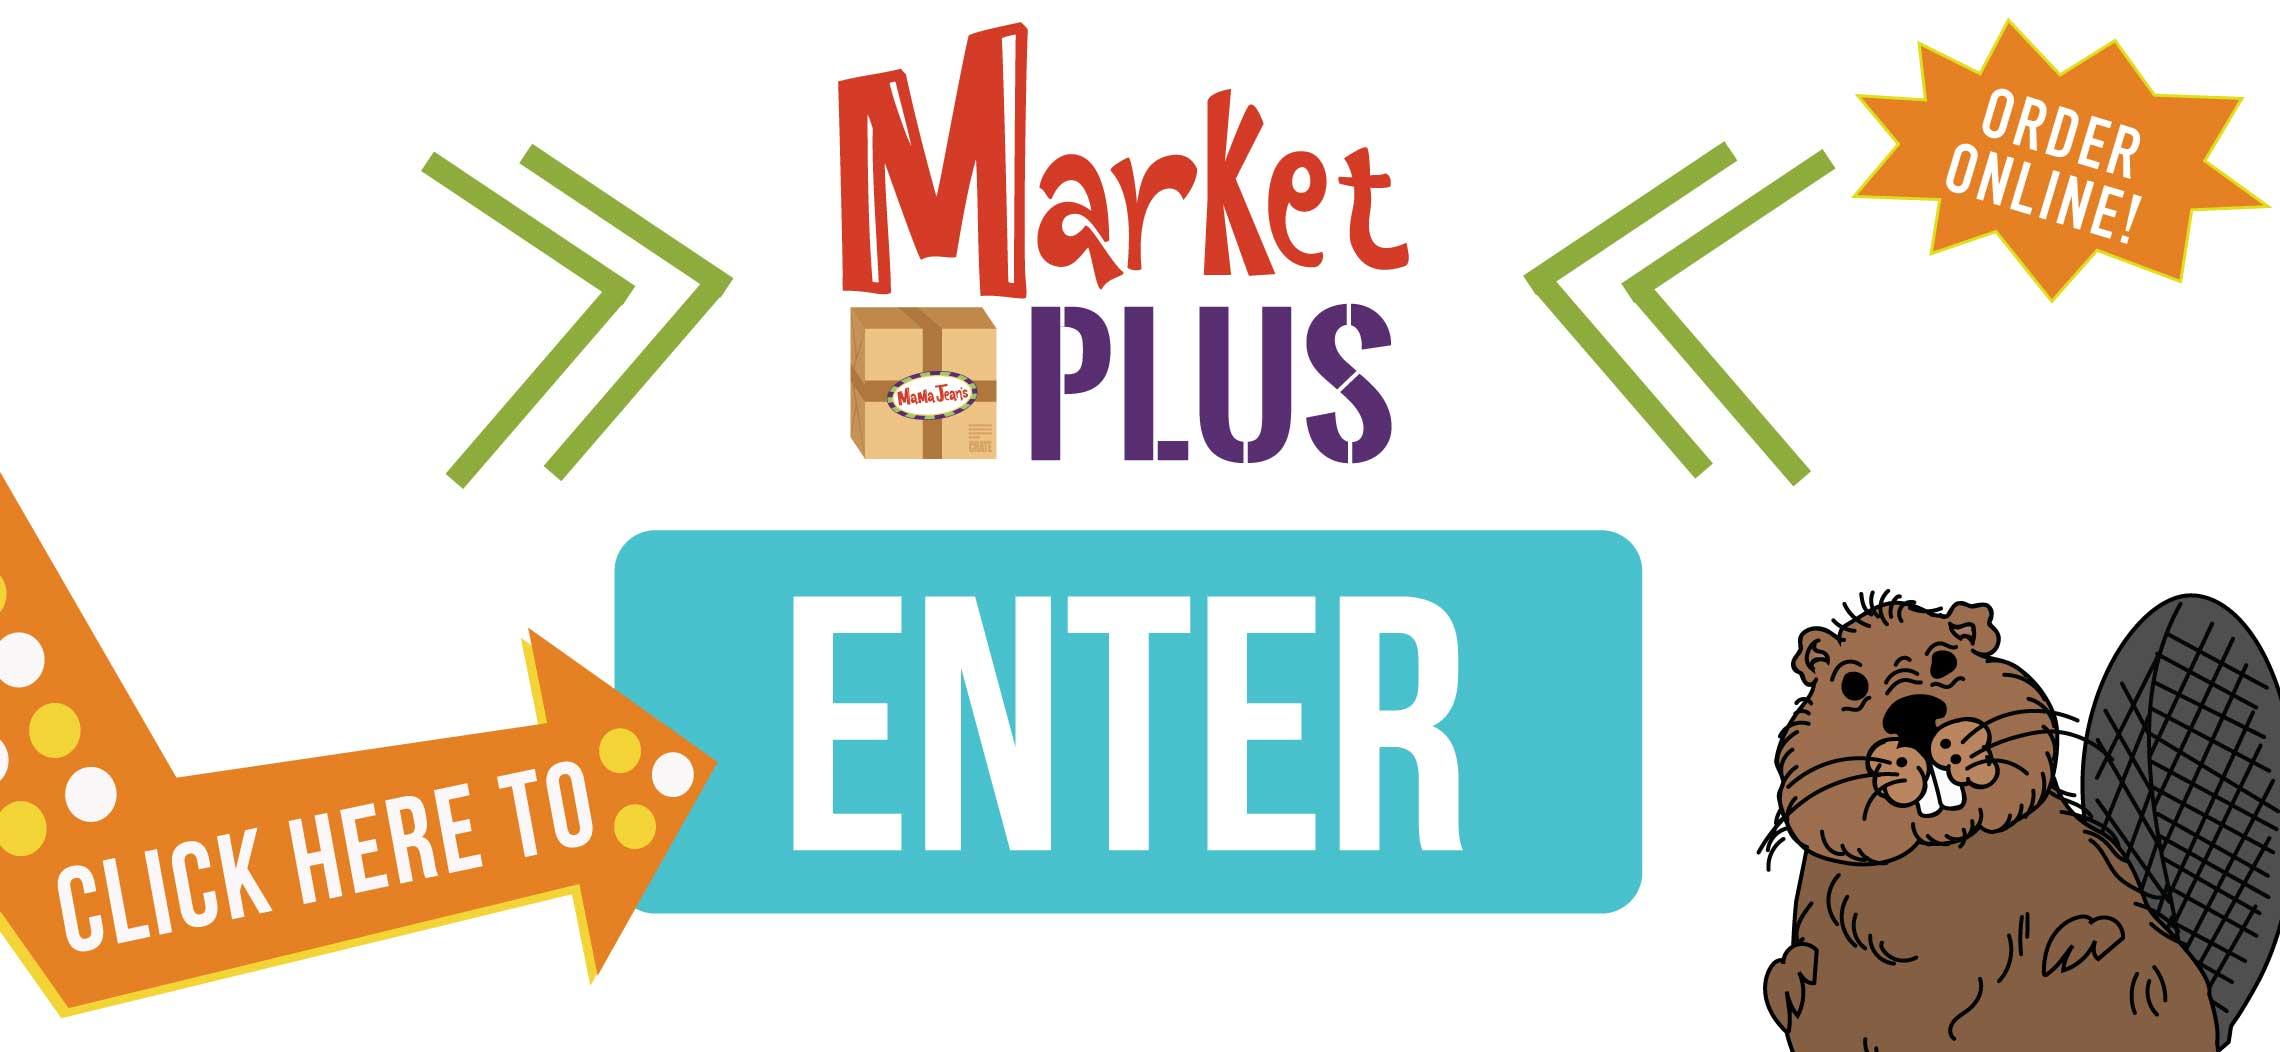 Click to Enter Market Plus